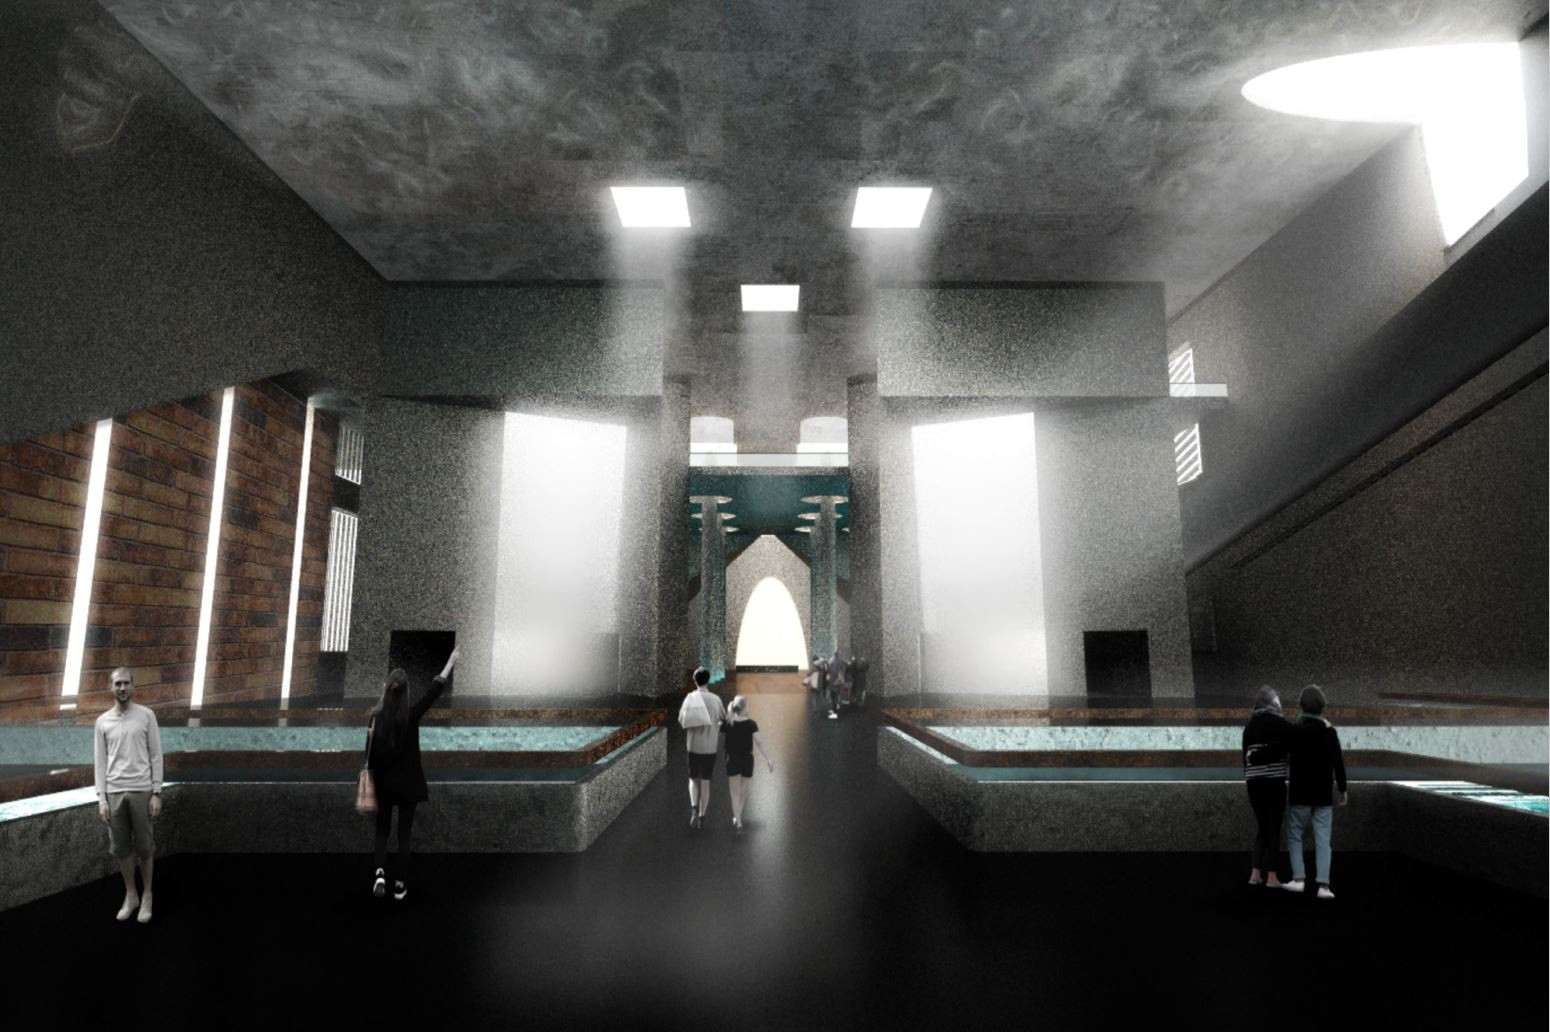 Hall of Reflection